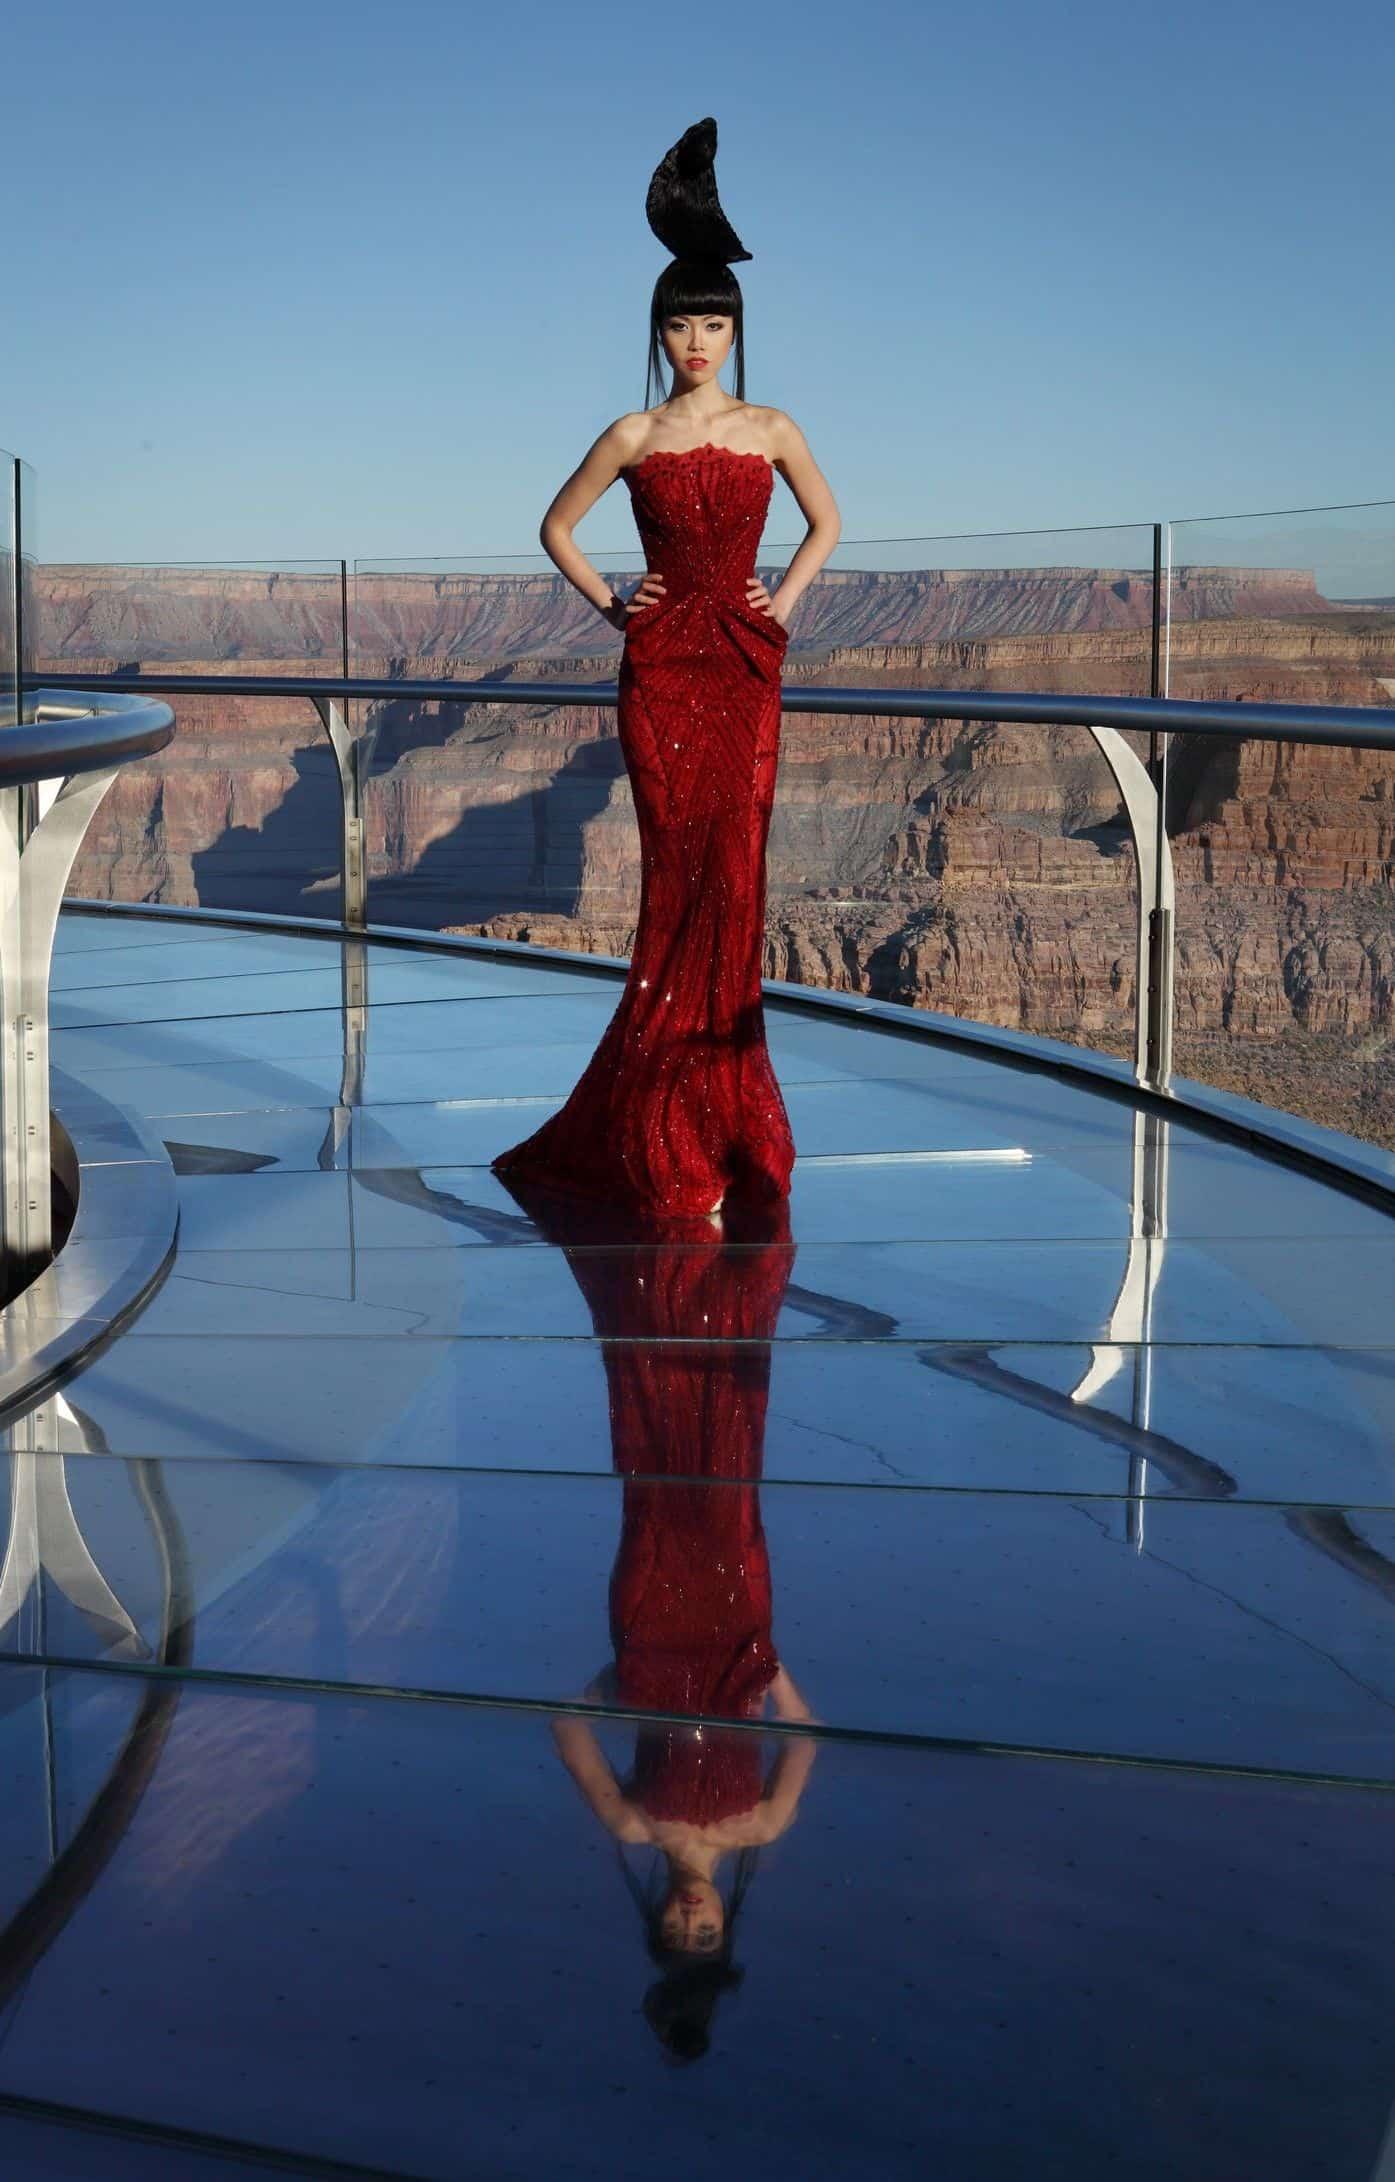 Jessica-Minh-Anh-Fashion-Shows-Fashion-and-Style-Magazine-J-Autumn-Fashion-Show-20Fashion Show at The Grand Canyon